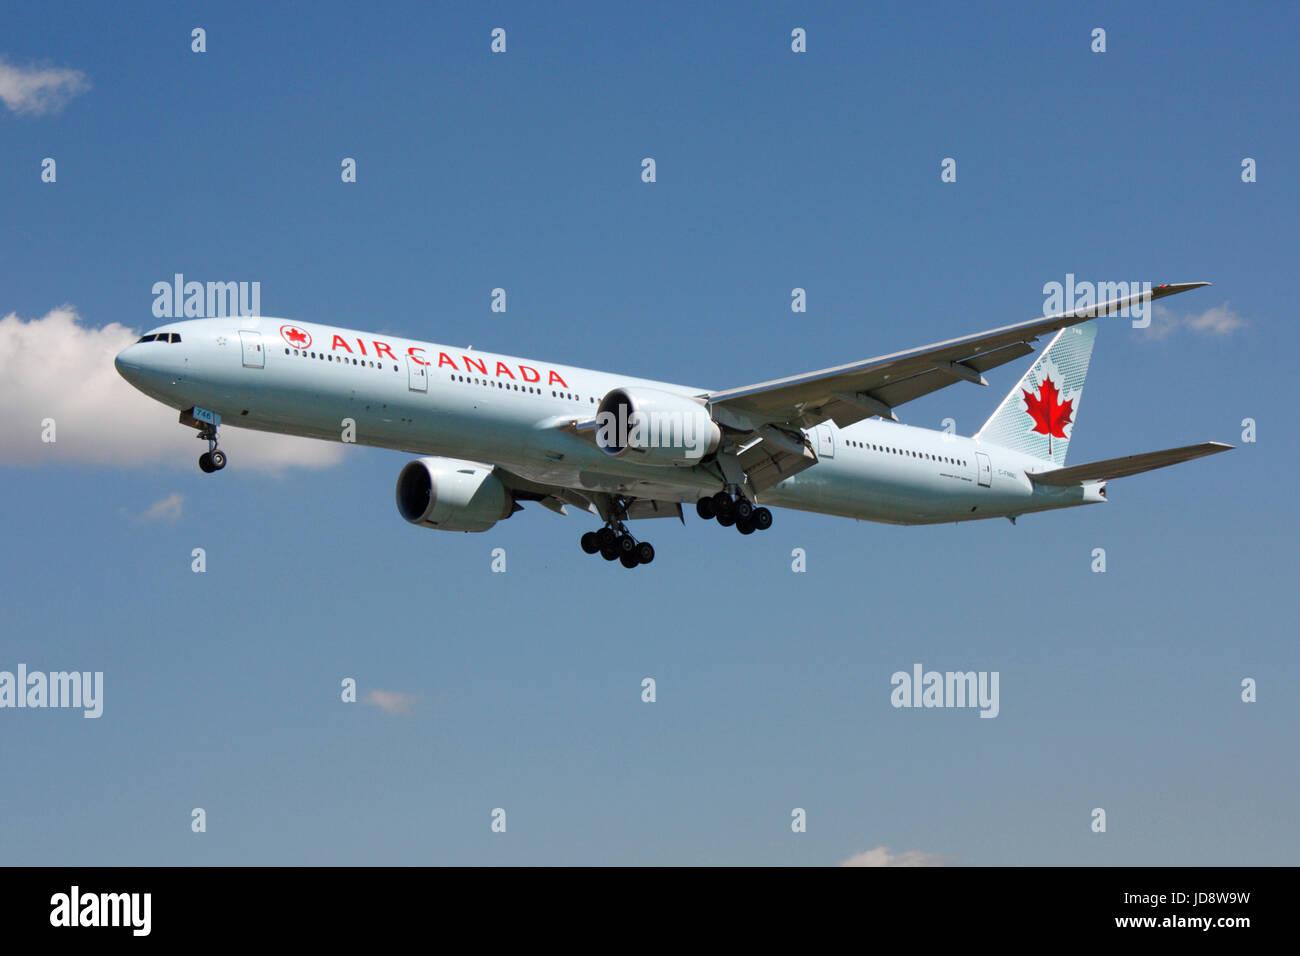 Commercial aviation and transatlantic flight. Air Canada Boeing 777-300ER long haul passenger jet plane on approach Stock Photo